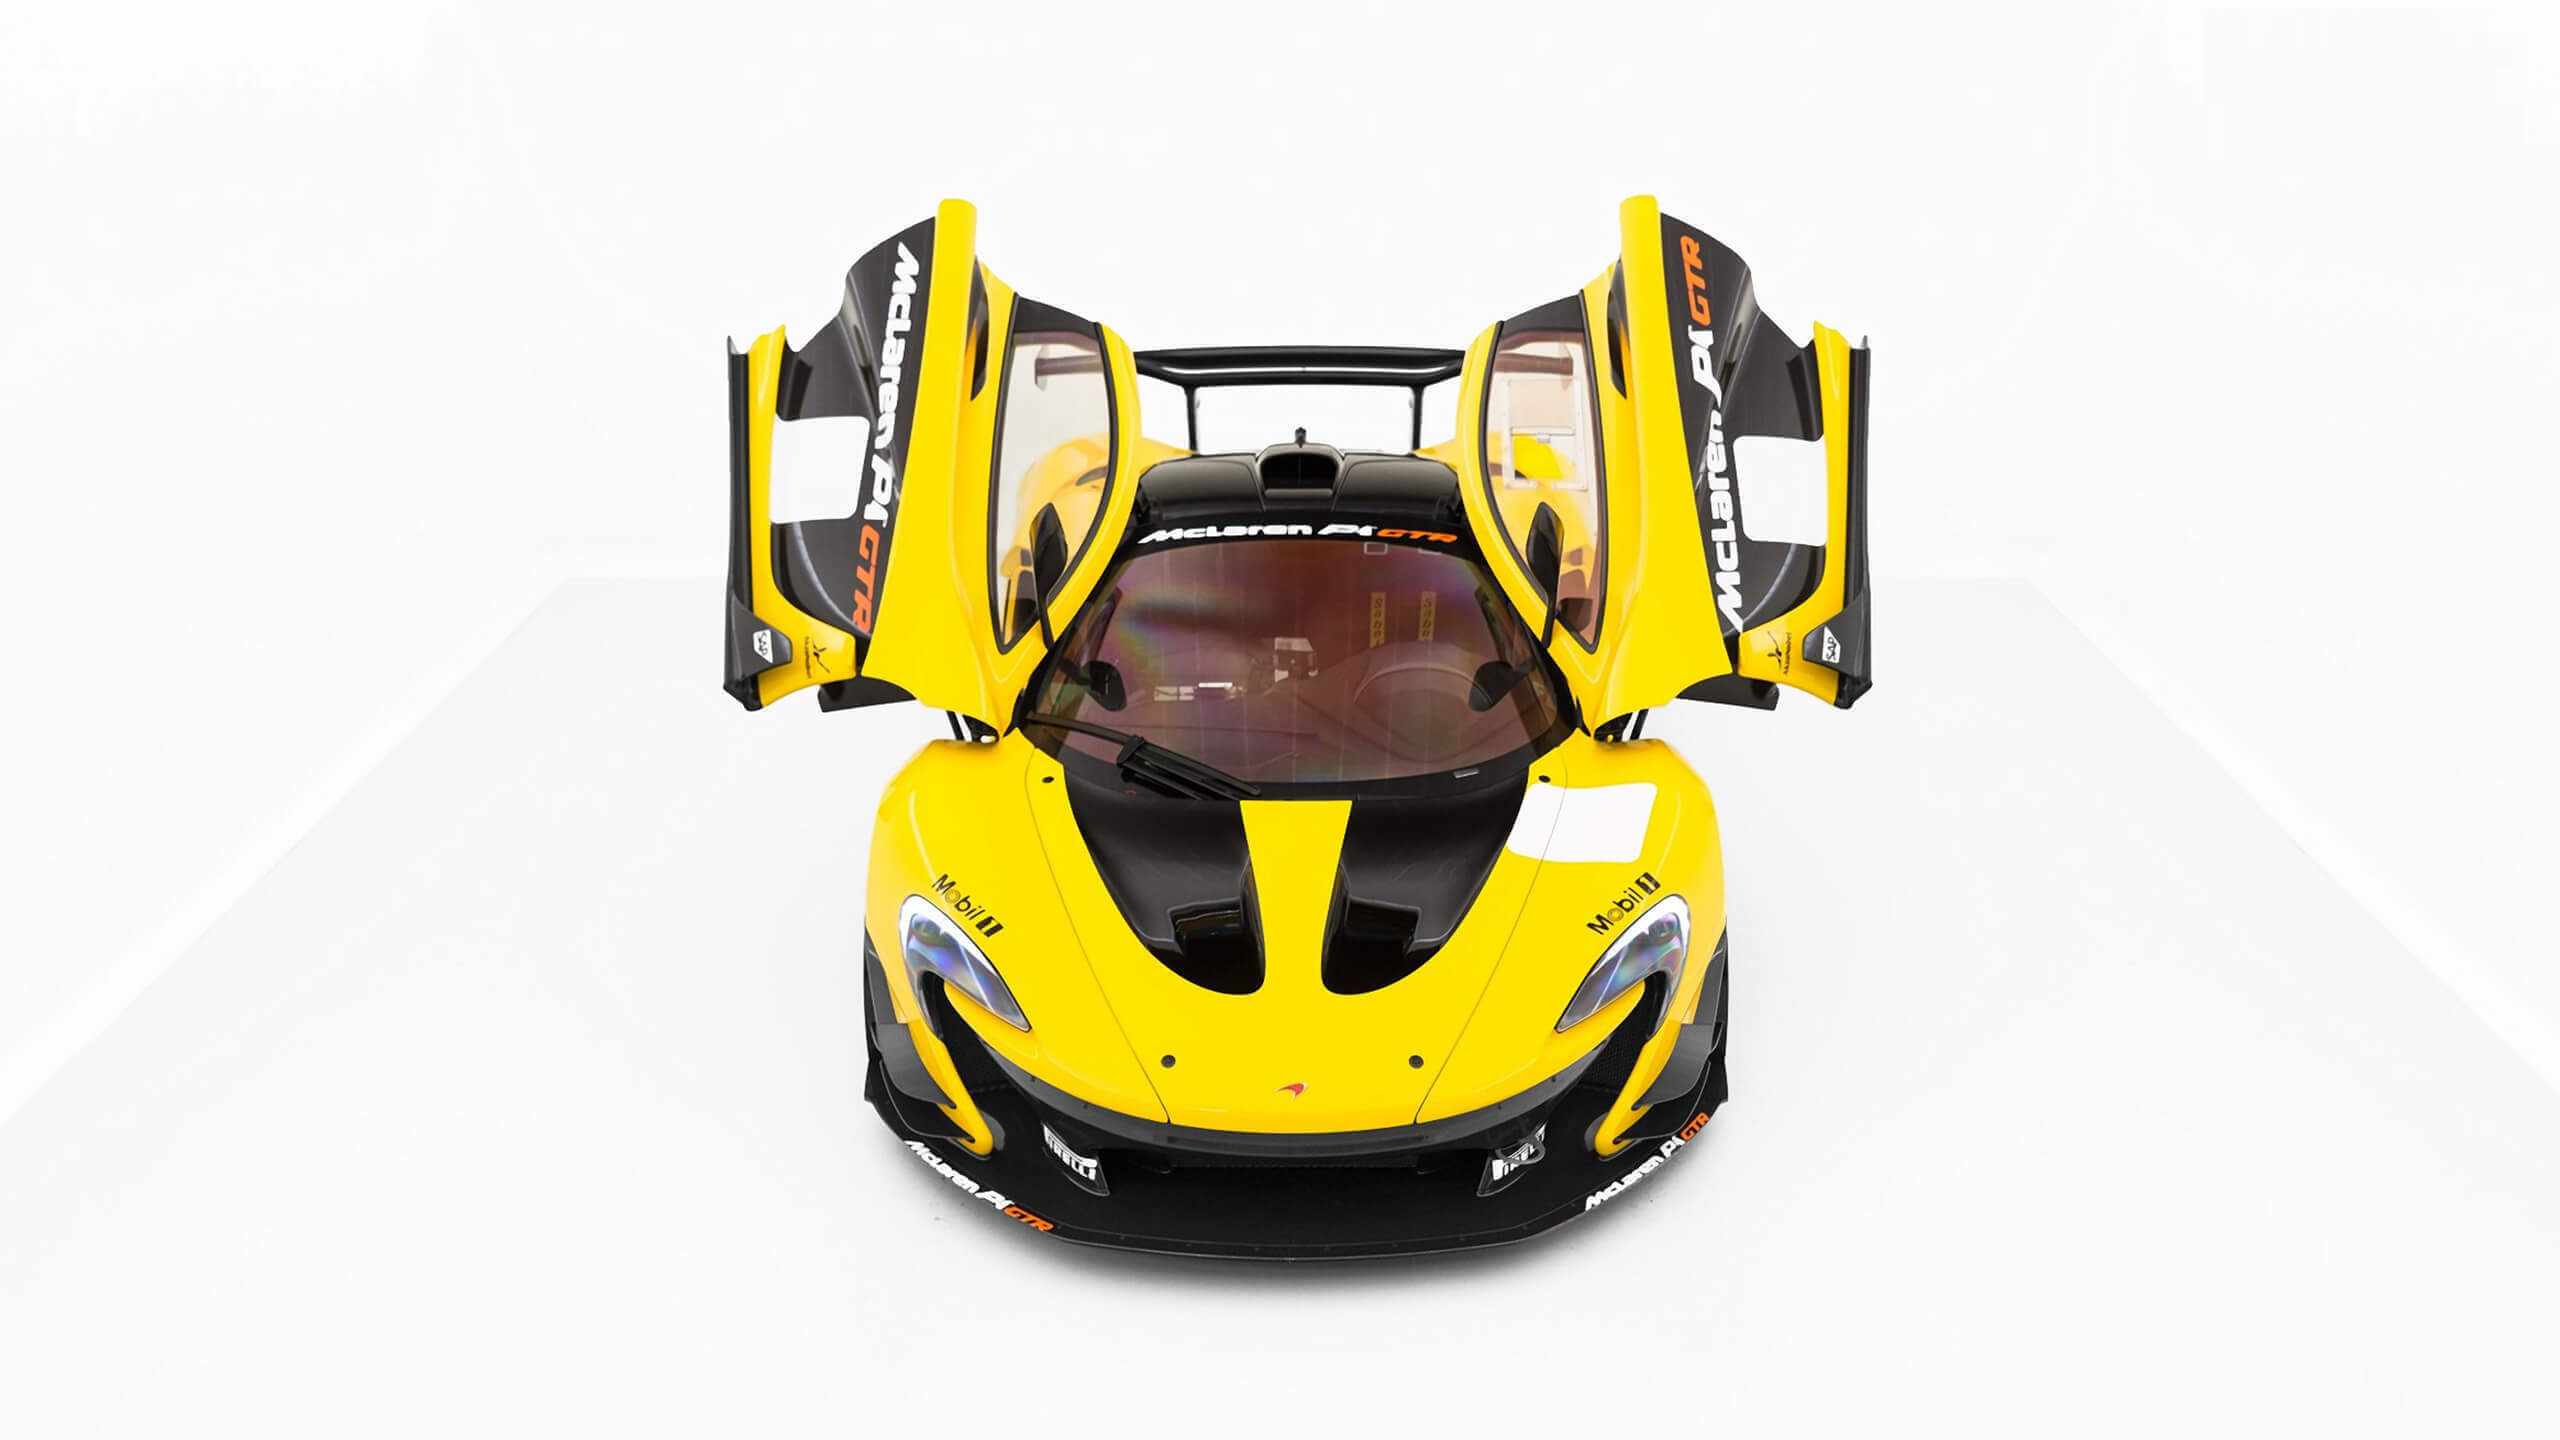 Street-legal-McLaren-P1-GTR-for-sale-8